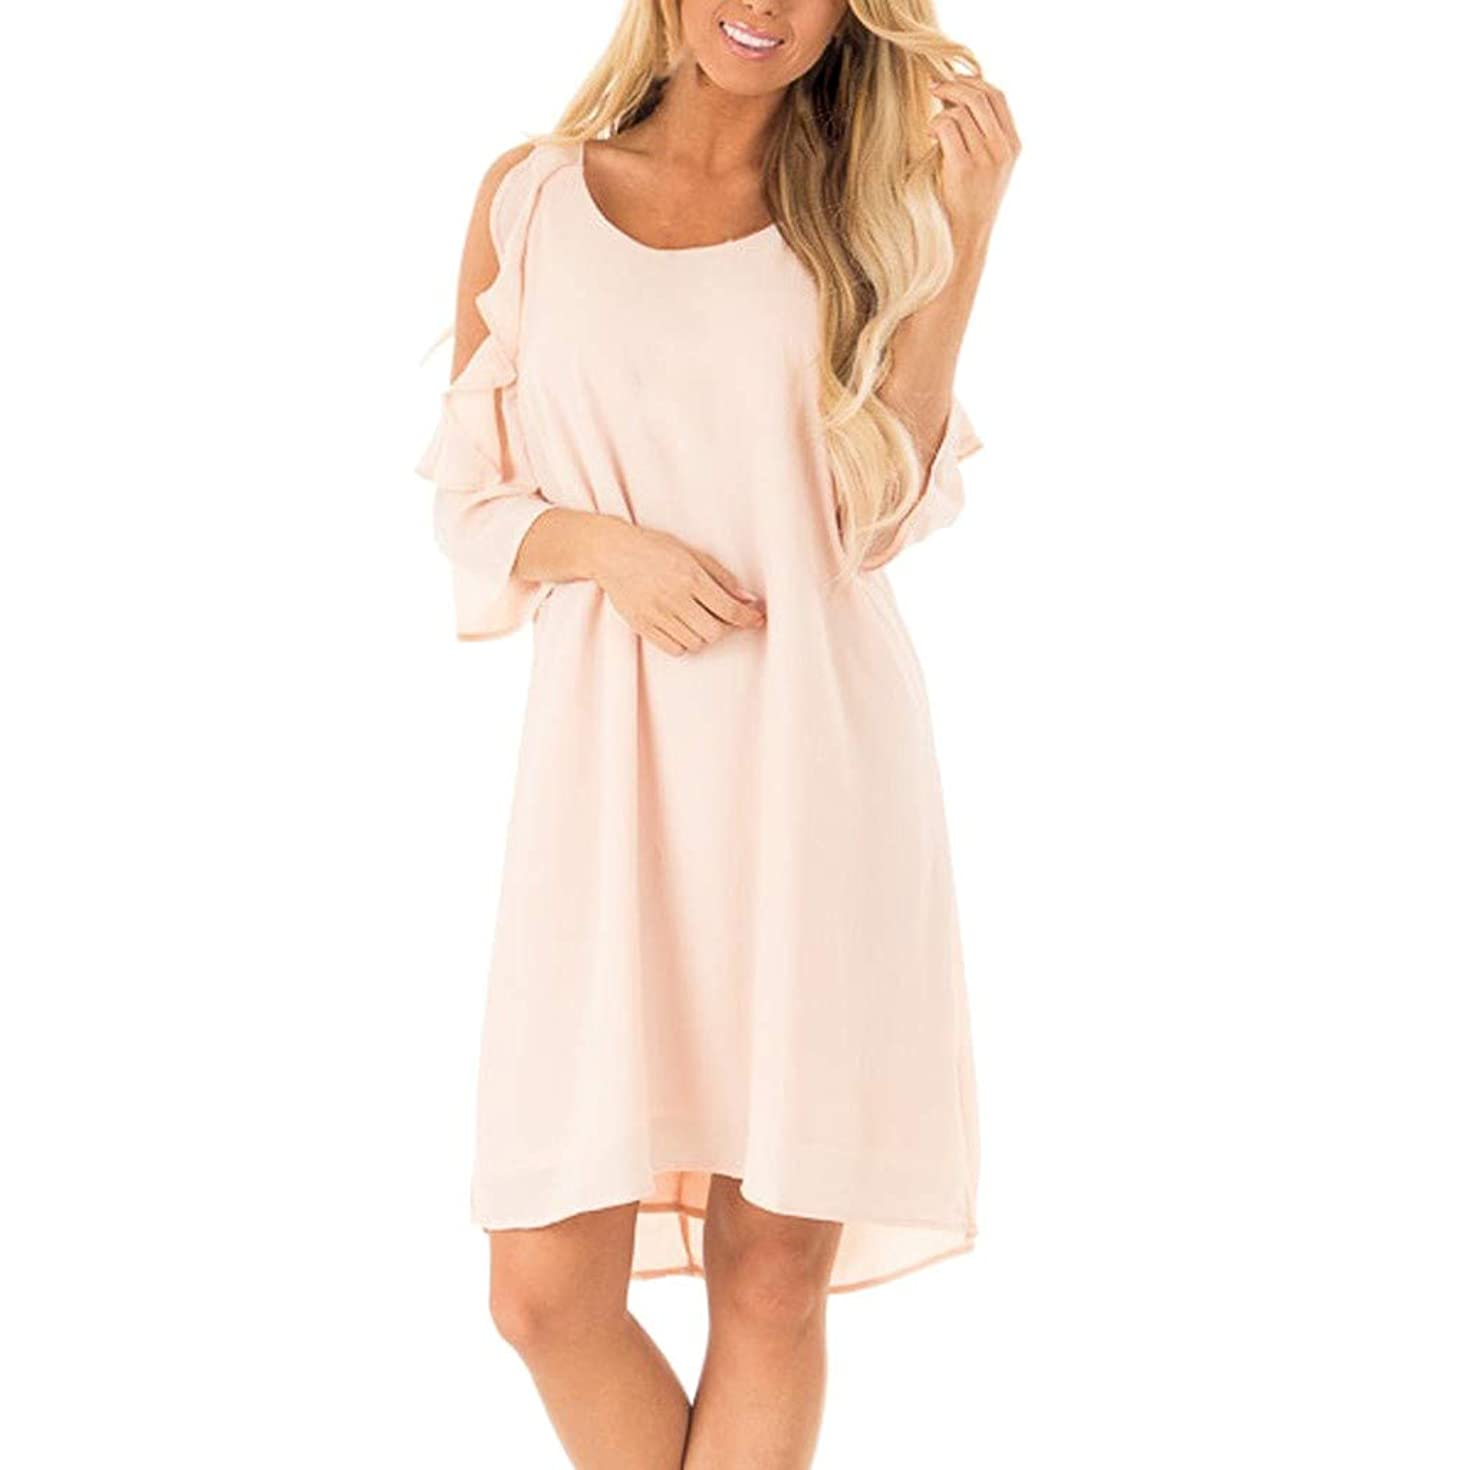 peacur Women Half Sleeve Dresses Fashion Cold Shoulder Ruffle Solid Casual Loose Mini Shirt Dress